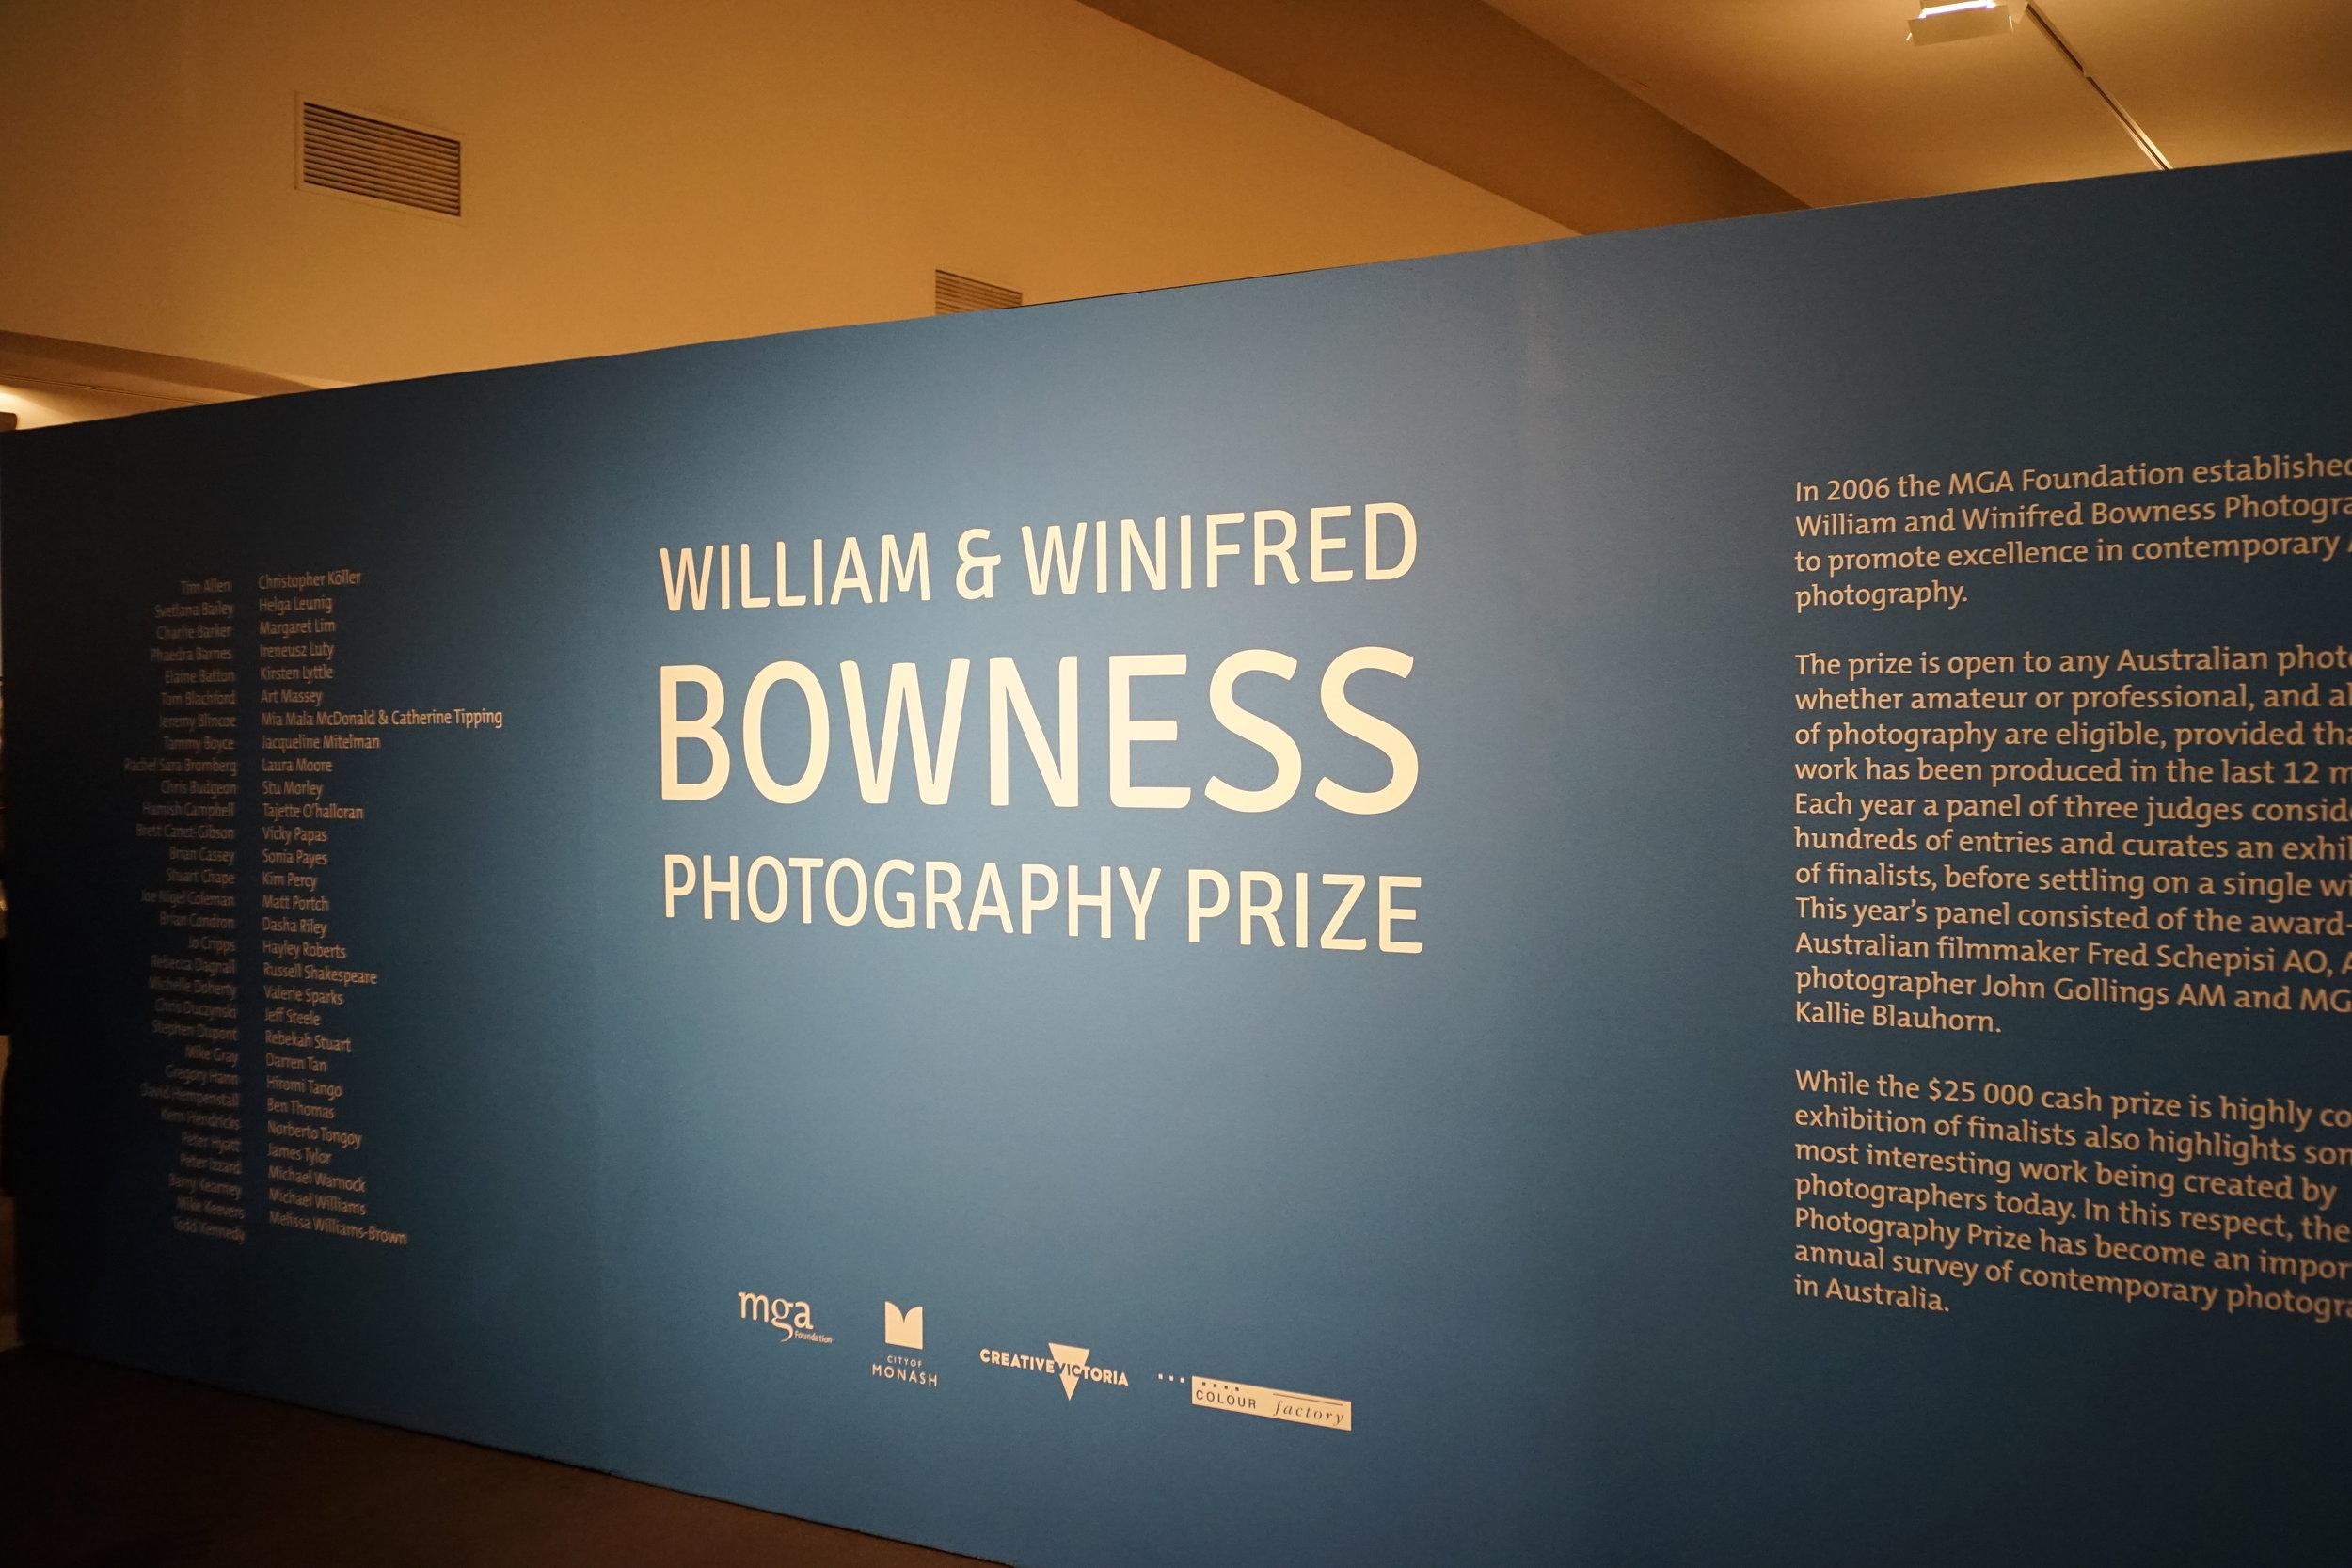 bowness-exhibit-photo-1.JPG